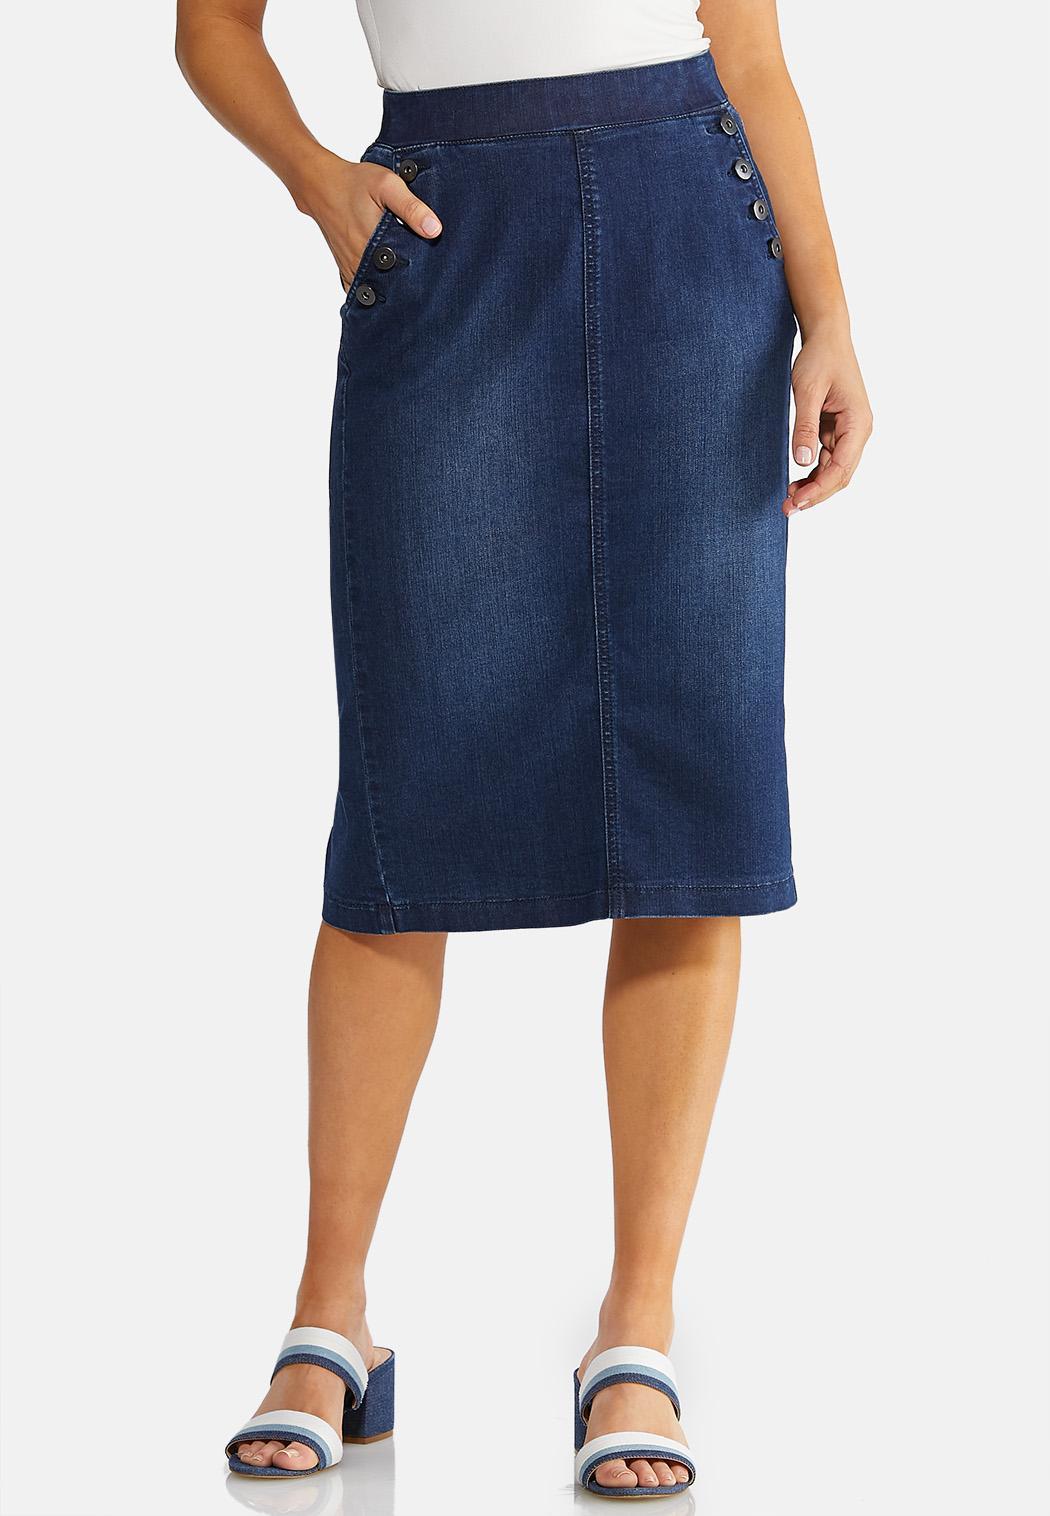 975a674c7 Plus Size Button Pocket Denim Skirt Skirts Cato Fashions